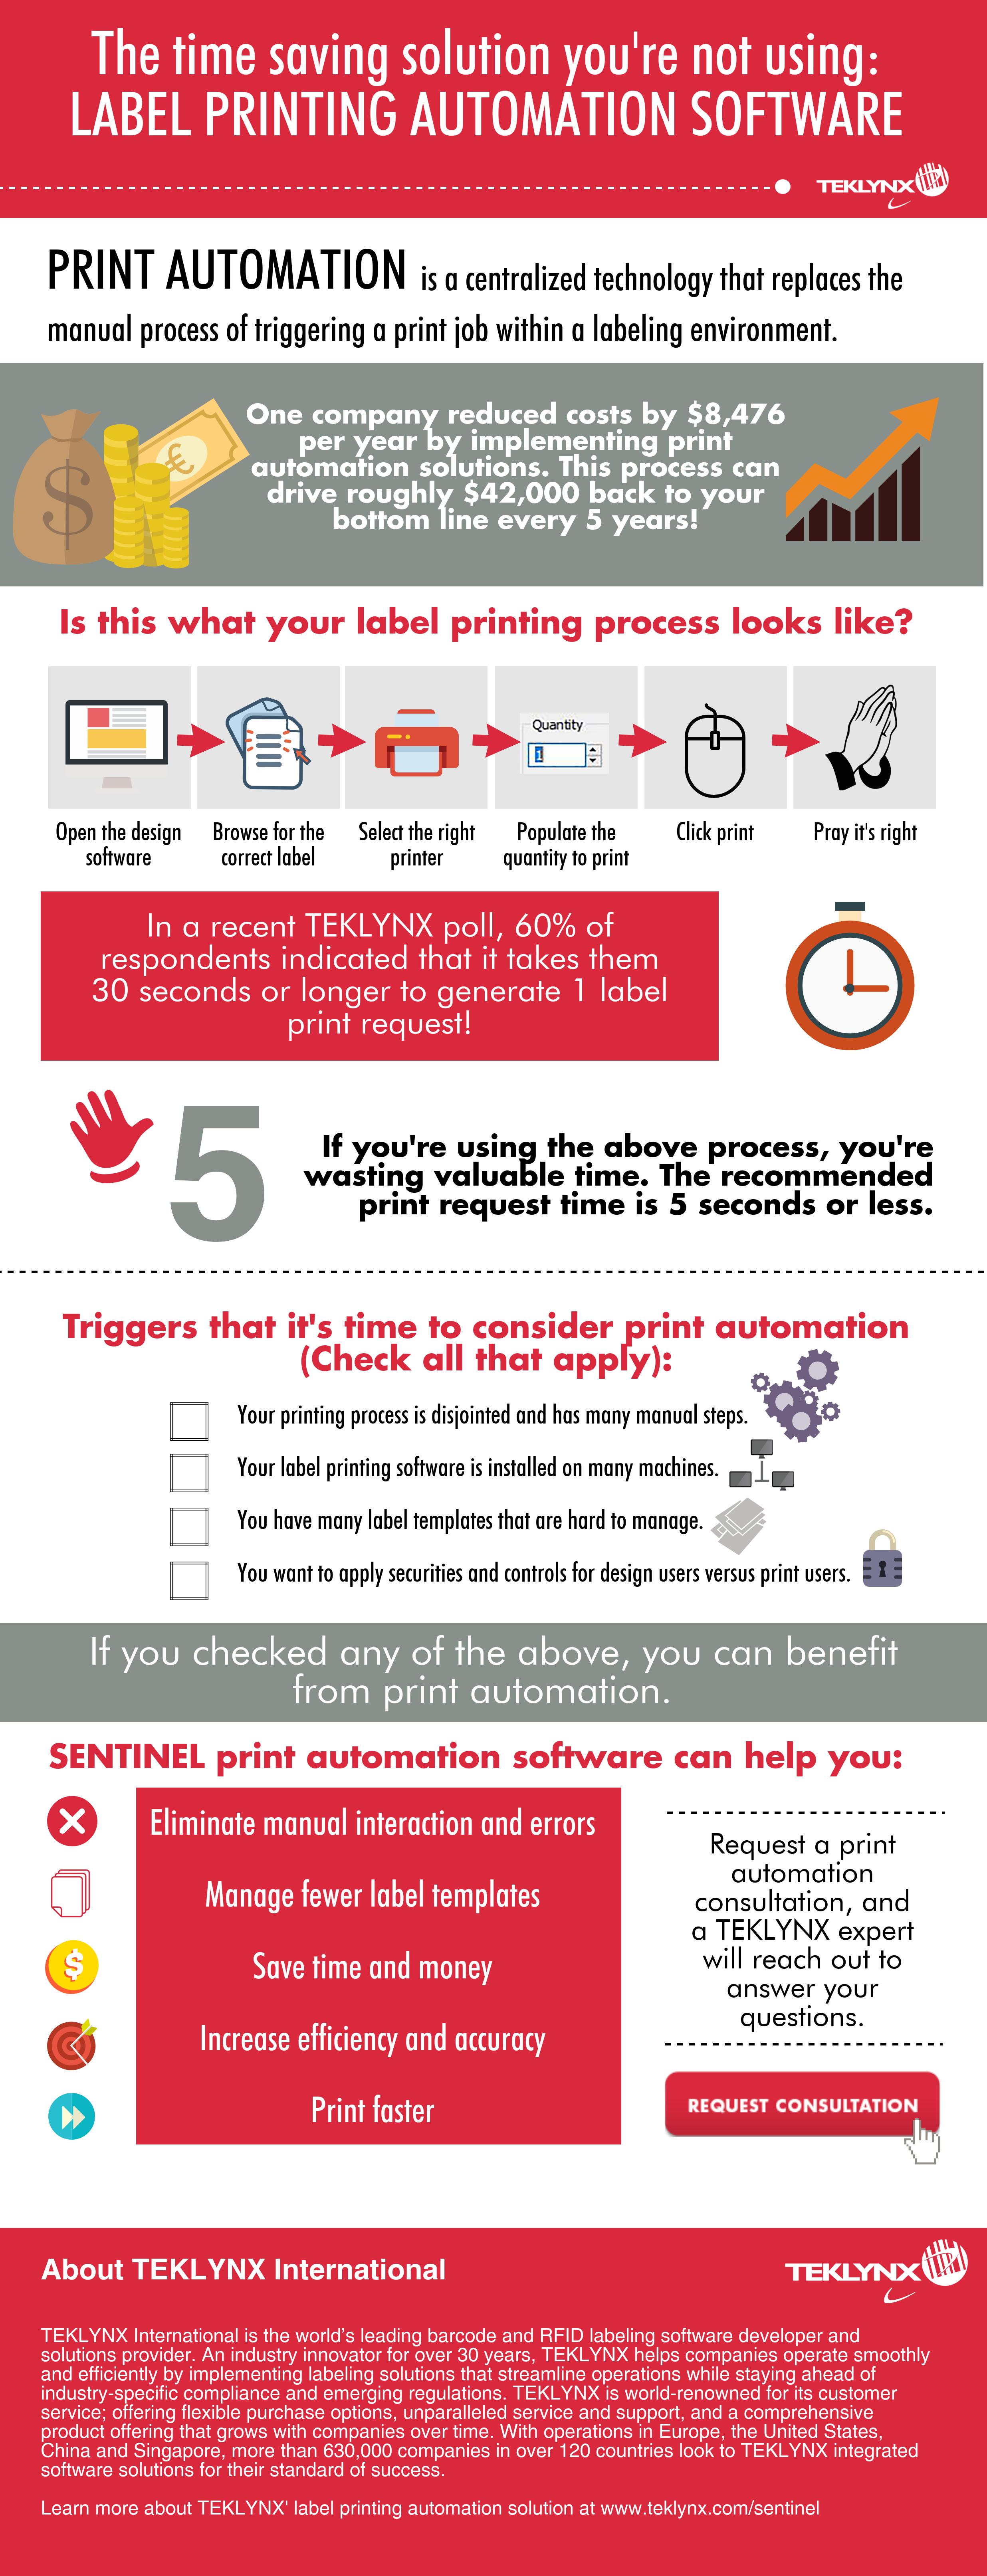 Infographic: Afdrukautomatisering